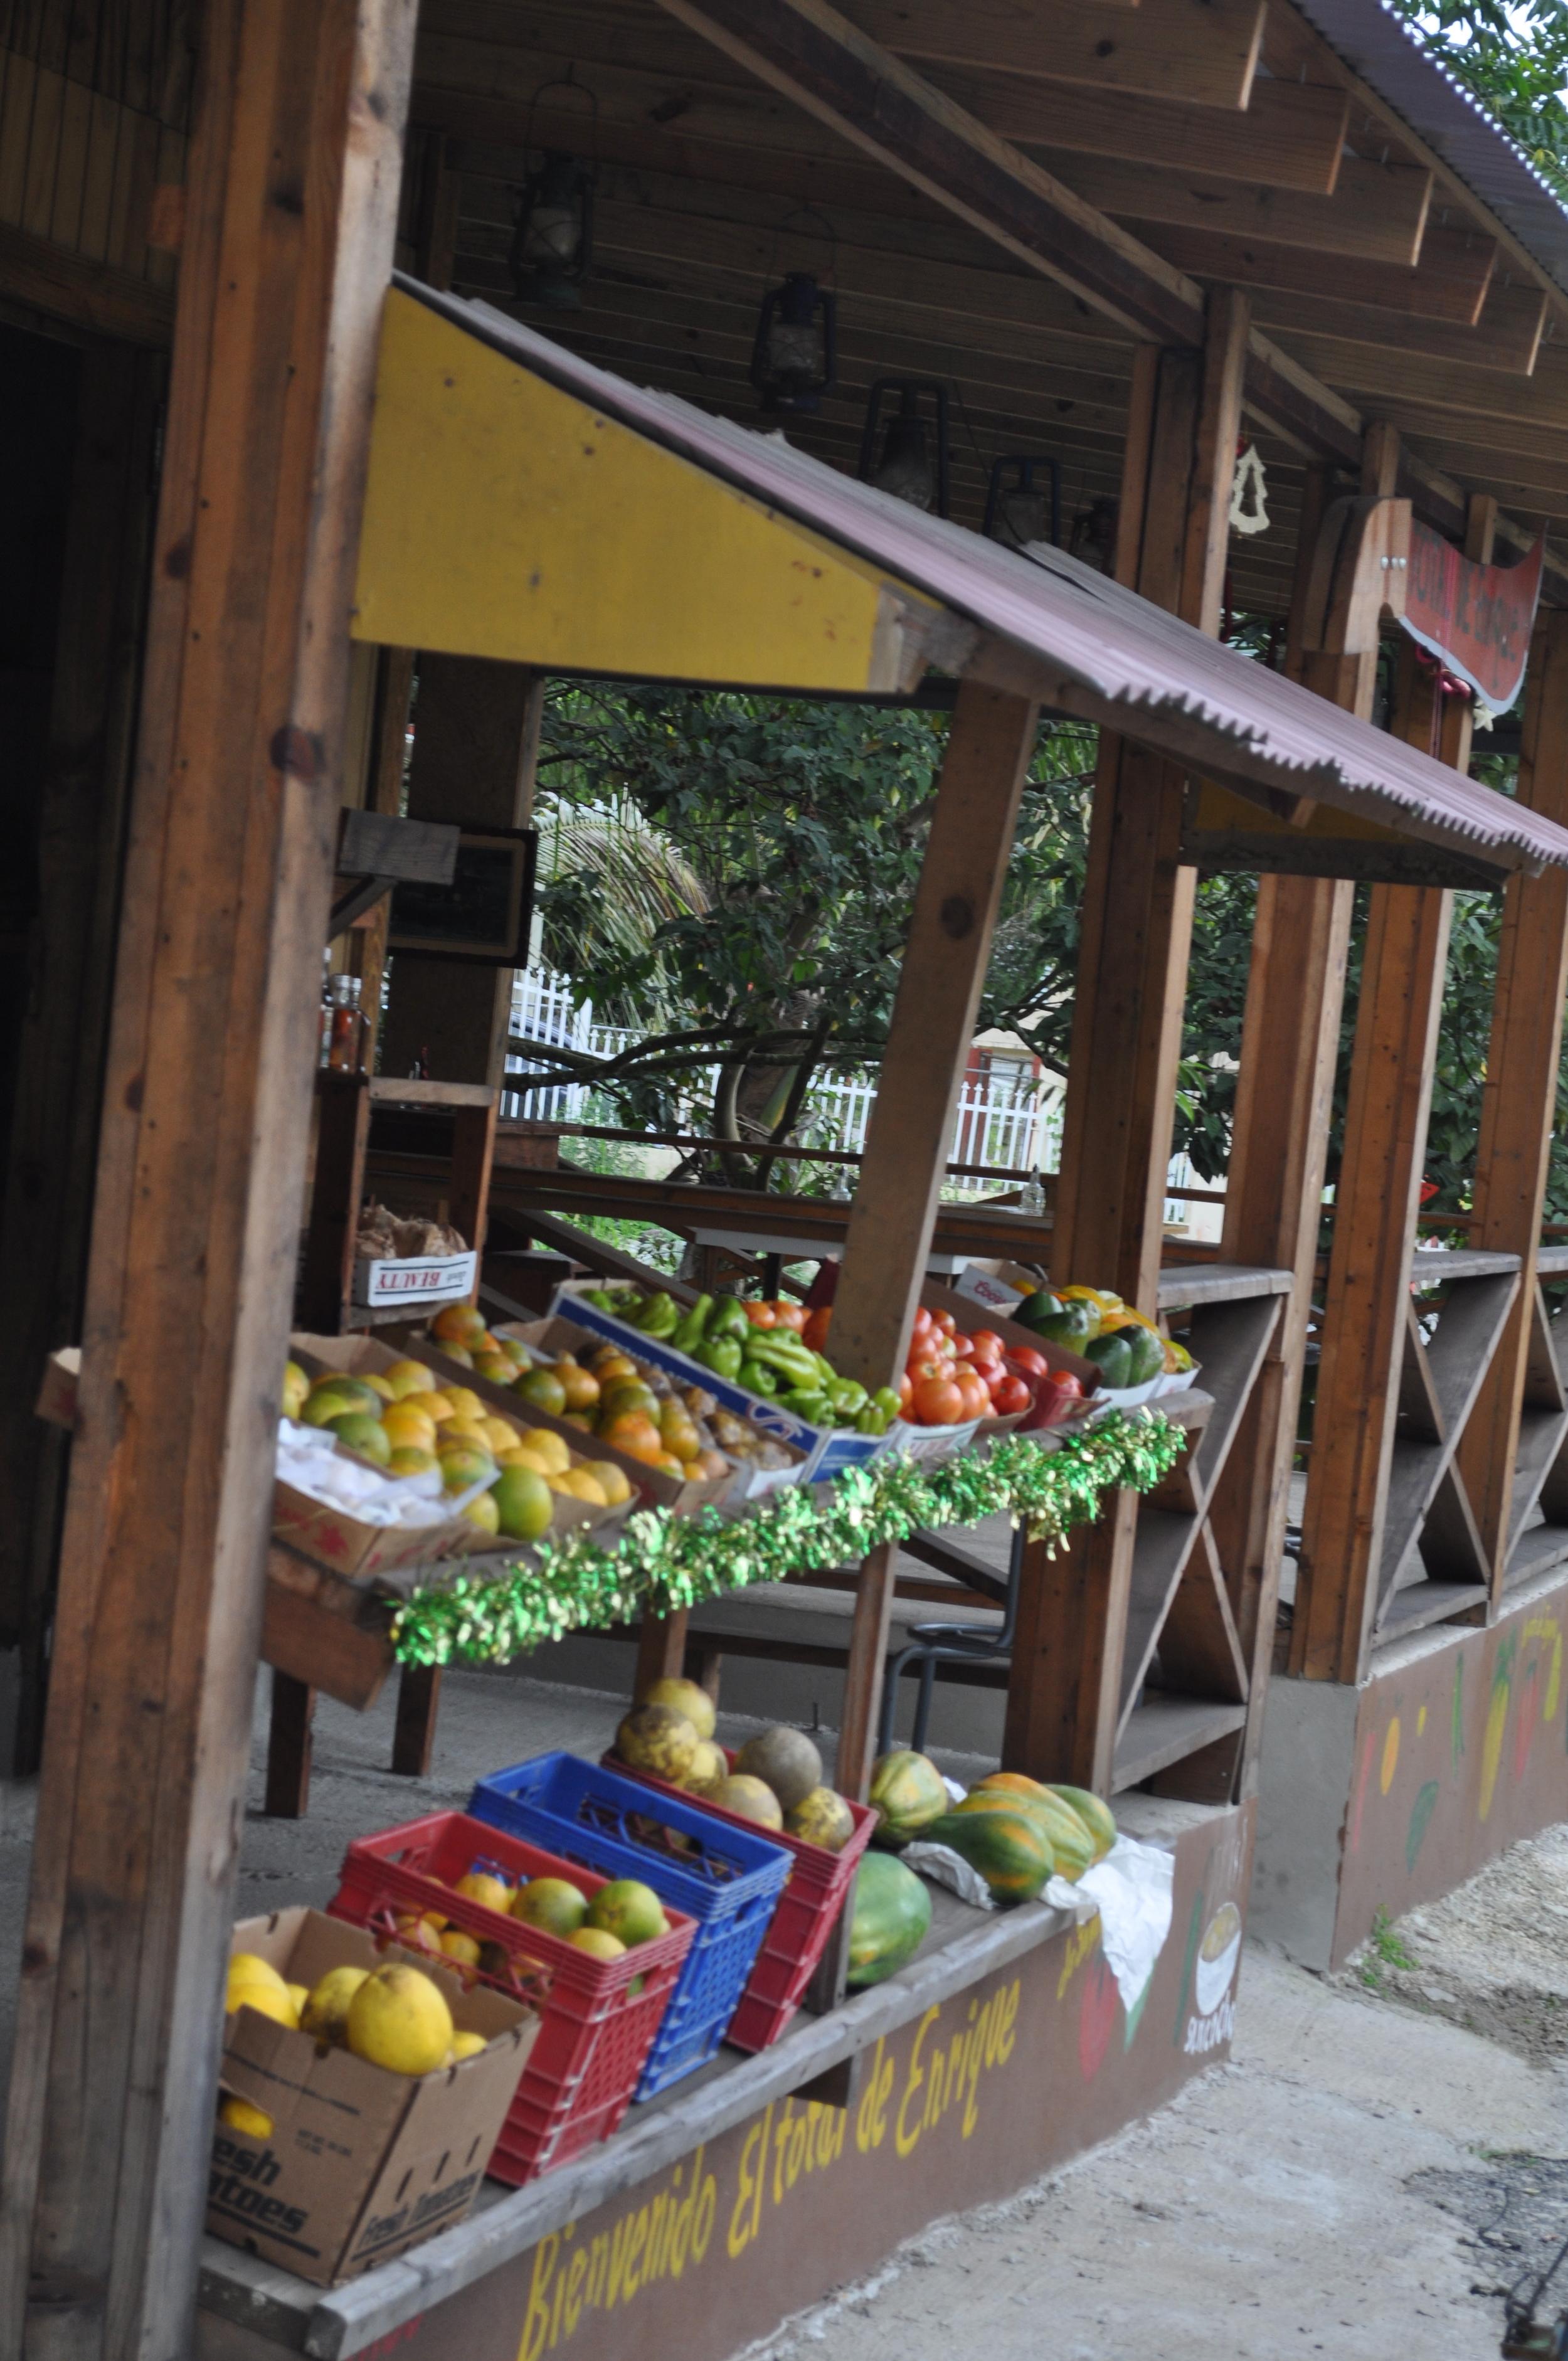 Fruits and vegetables in the Total de Enrique. Foto: Pamy Rojas